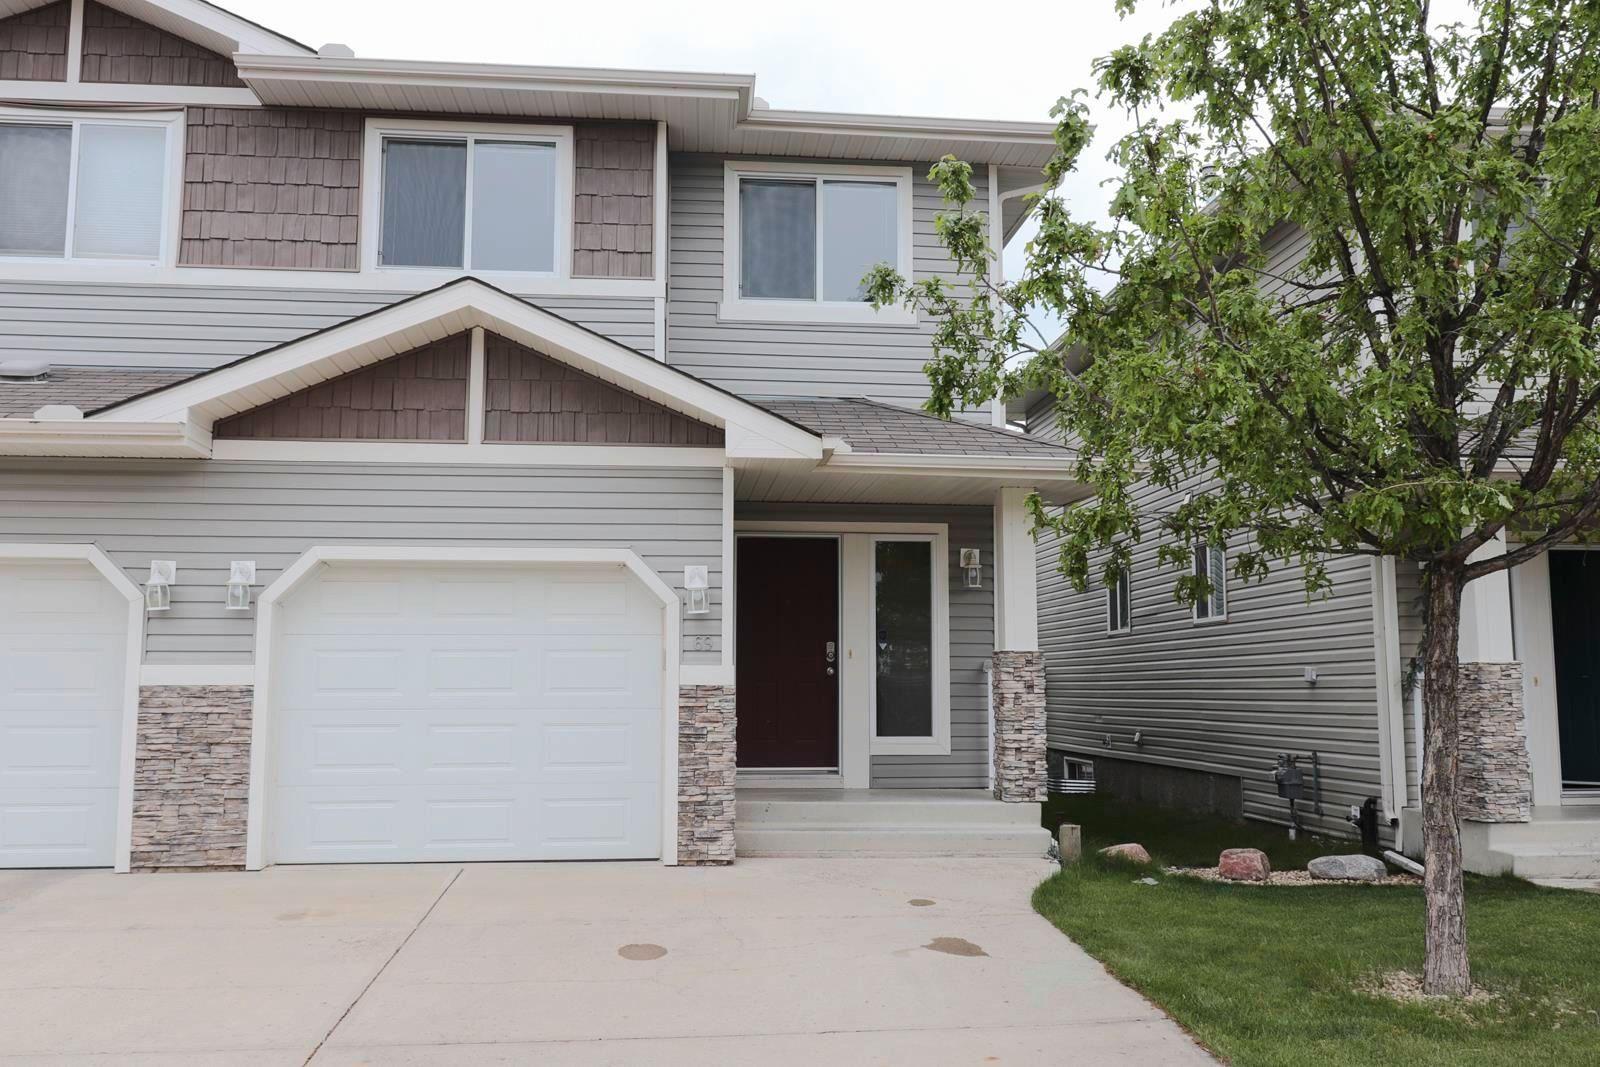 Main Photo: 69 133 EASTGATE Way: St. Albert House Half Duplex for sale : MLS®# E4249089